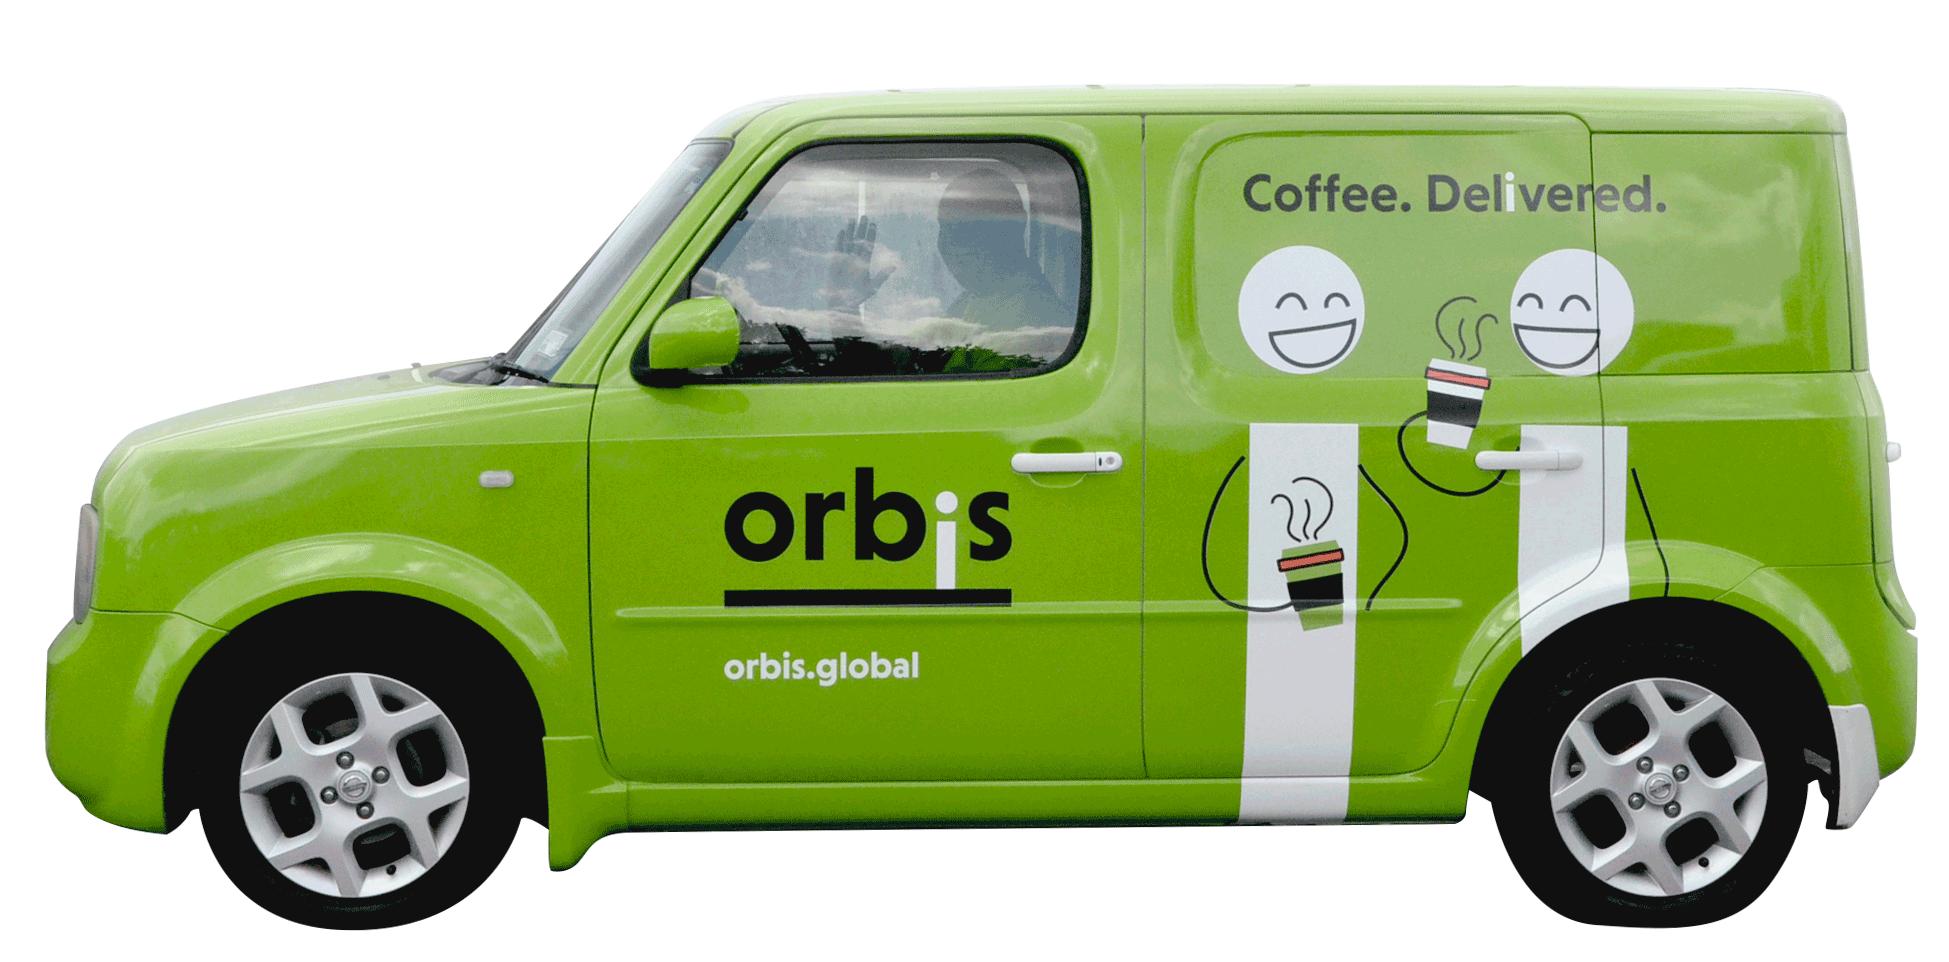 Orbis Coffee